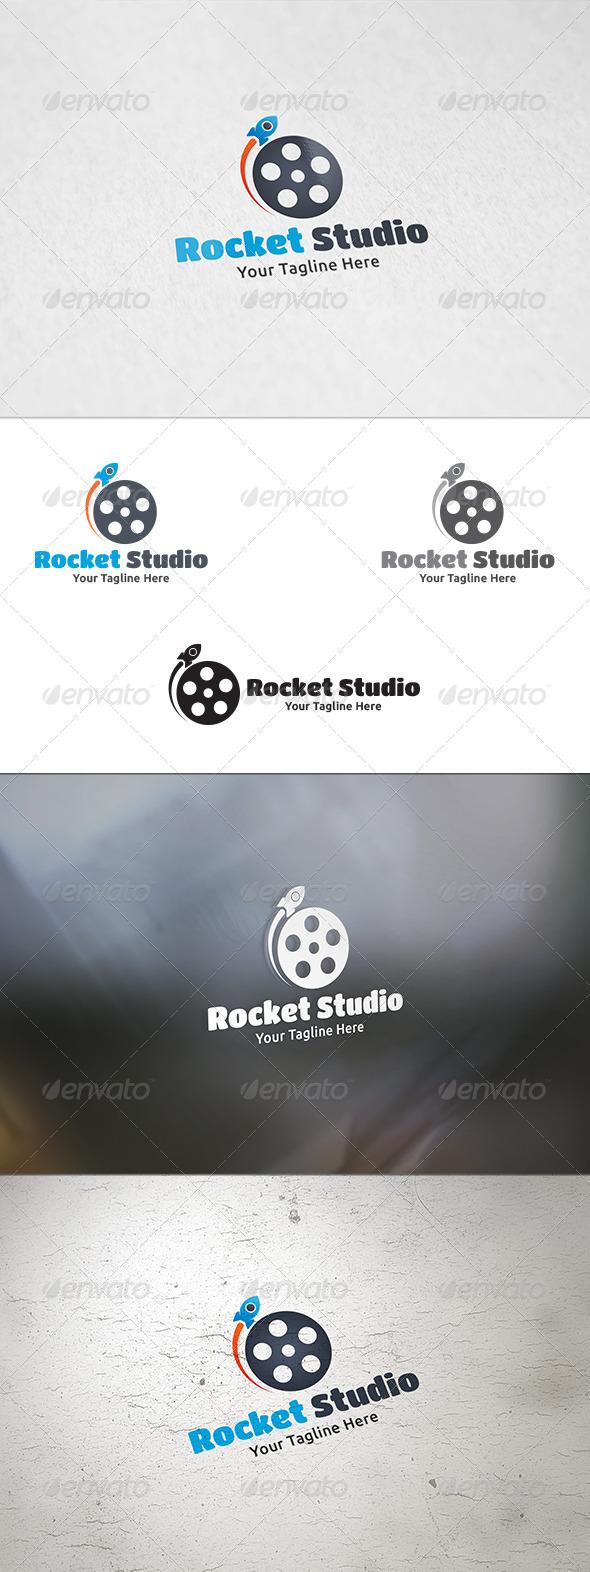 Rocket Studio - Logo Template